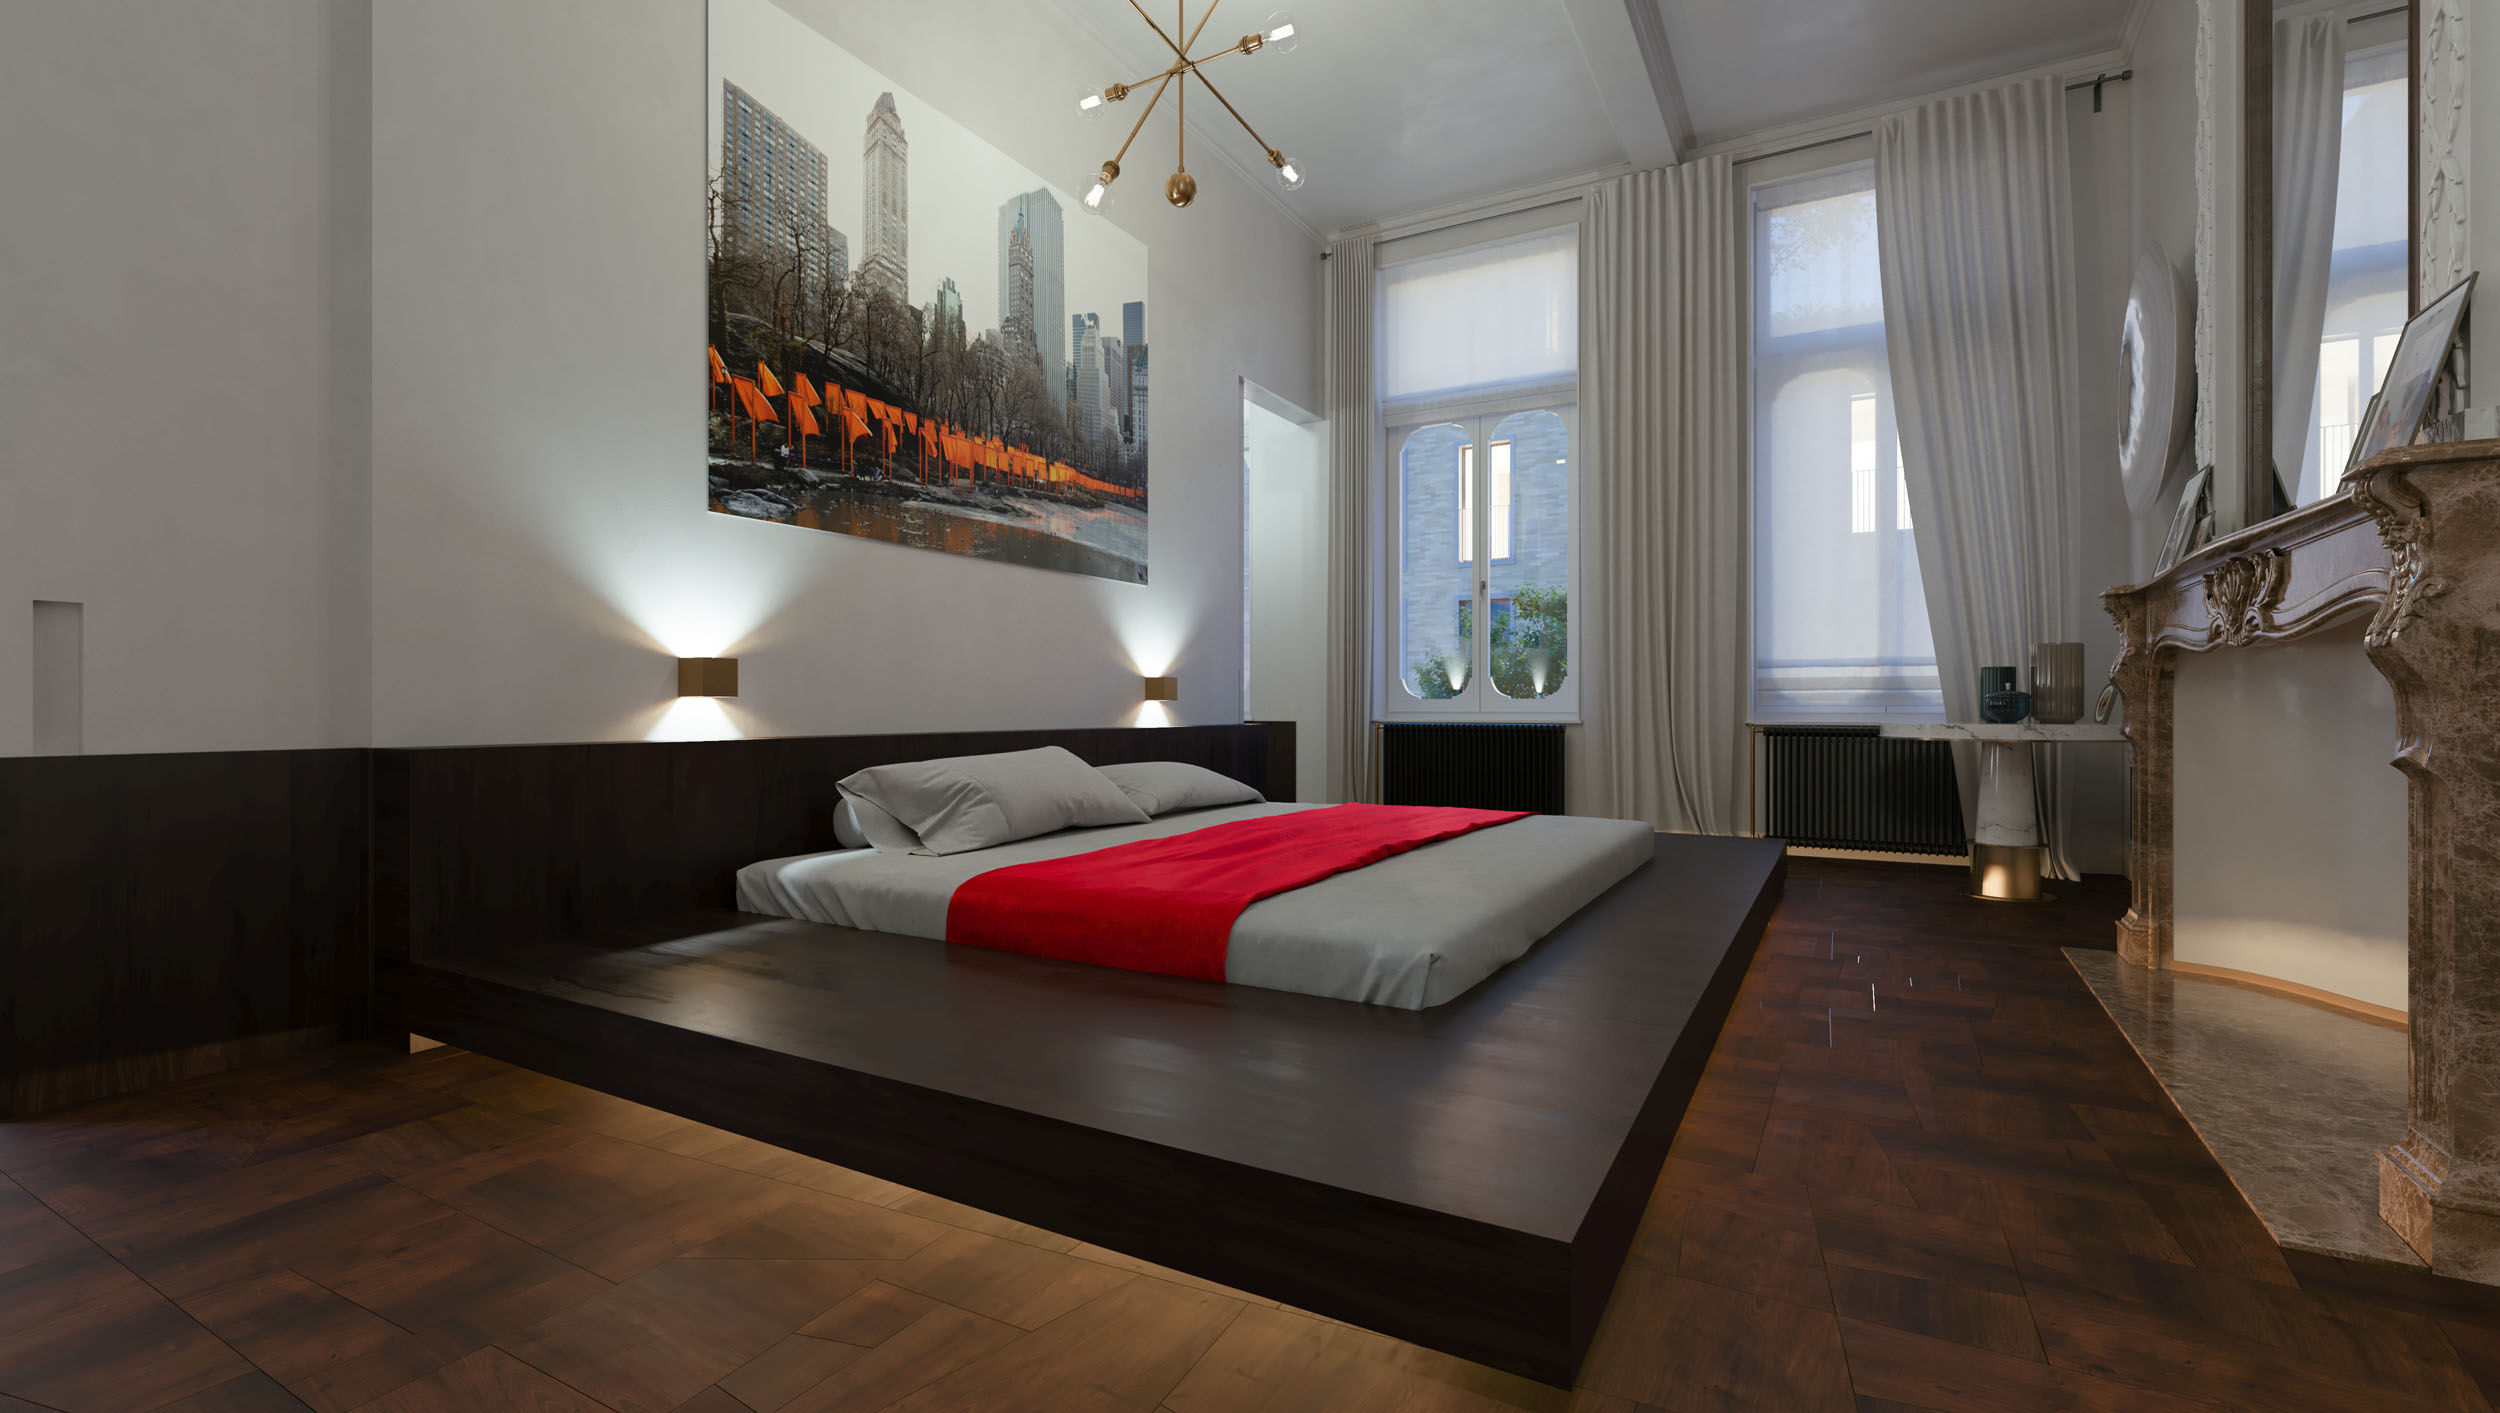 26A_RS_CAM_bedroom_EV.jpg